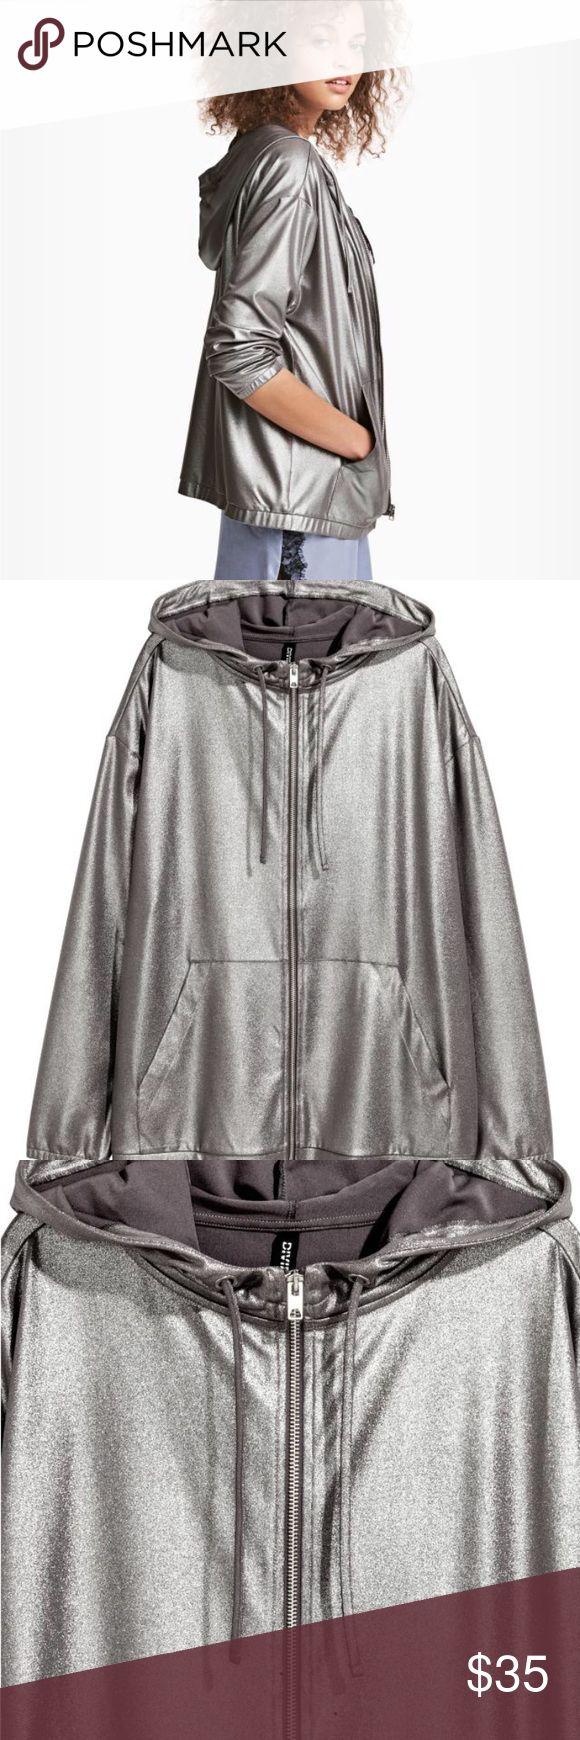 H&M metallic hoodie jacket Brand new. Light. Cool metallic color. Super comfy. H&M Jackets & Coats